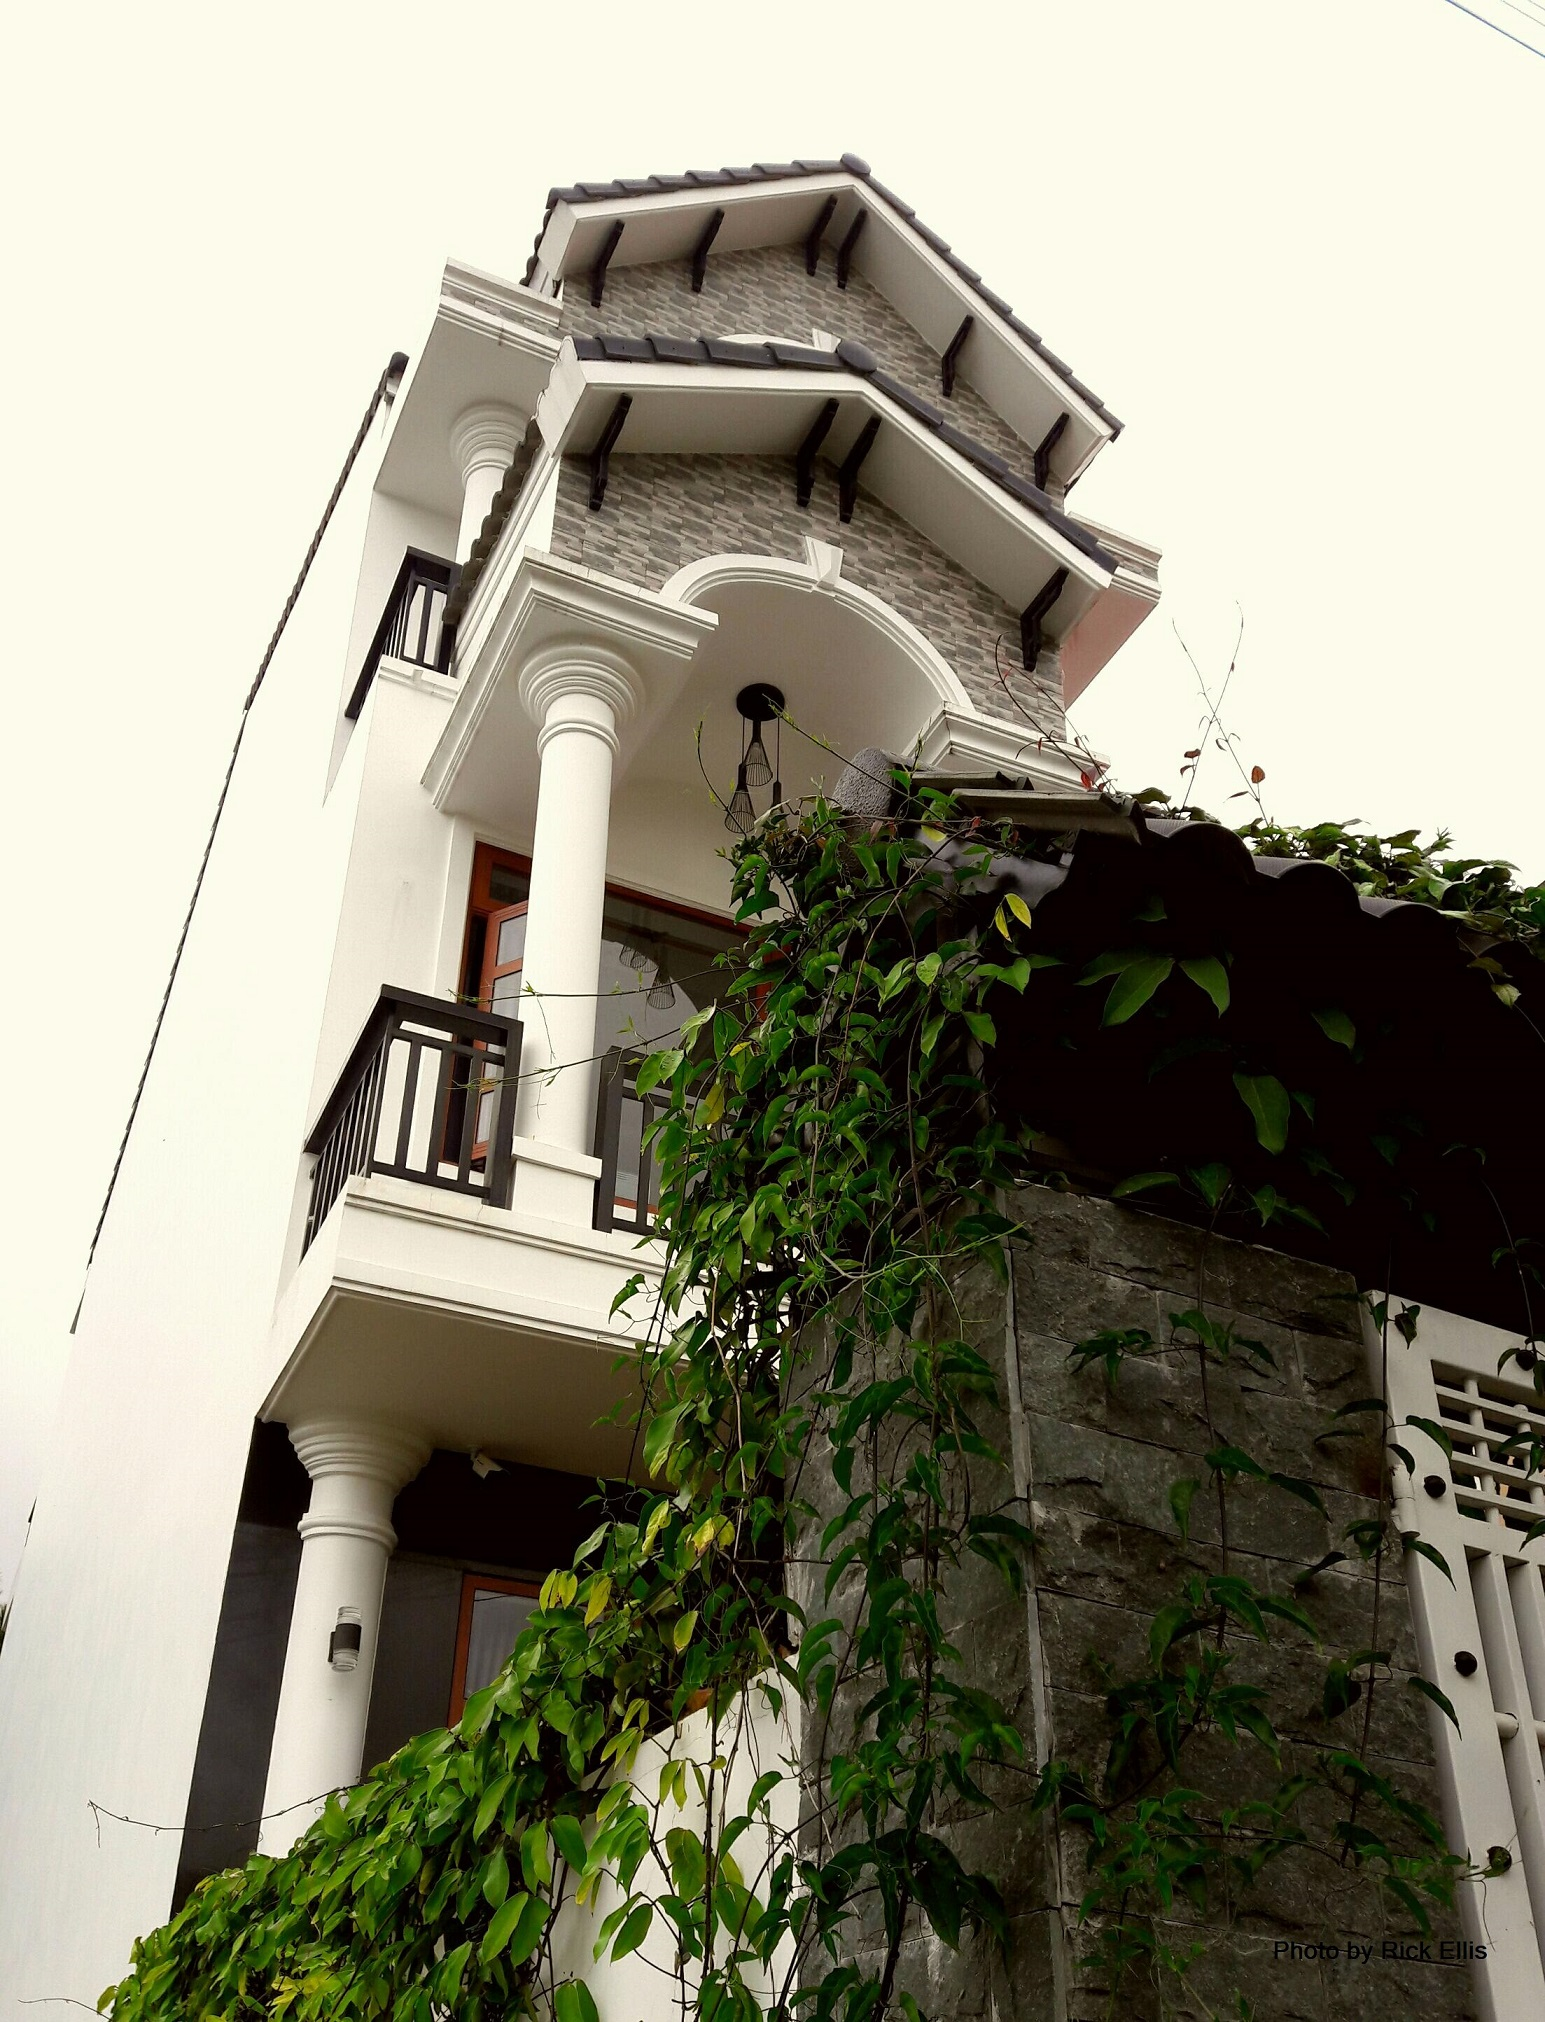 Slick house